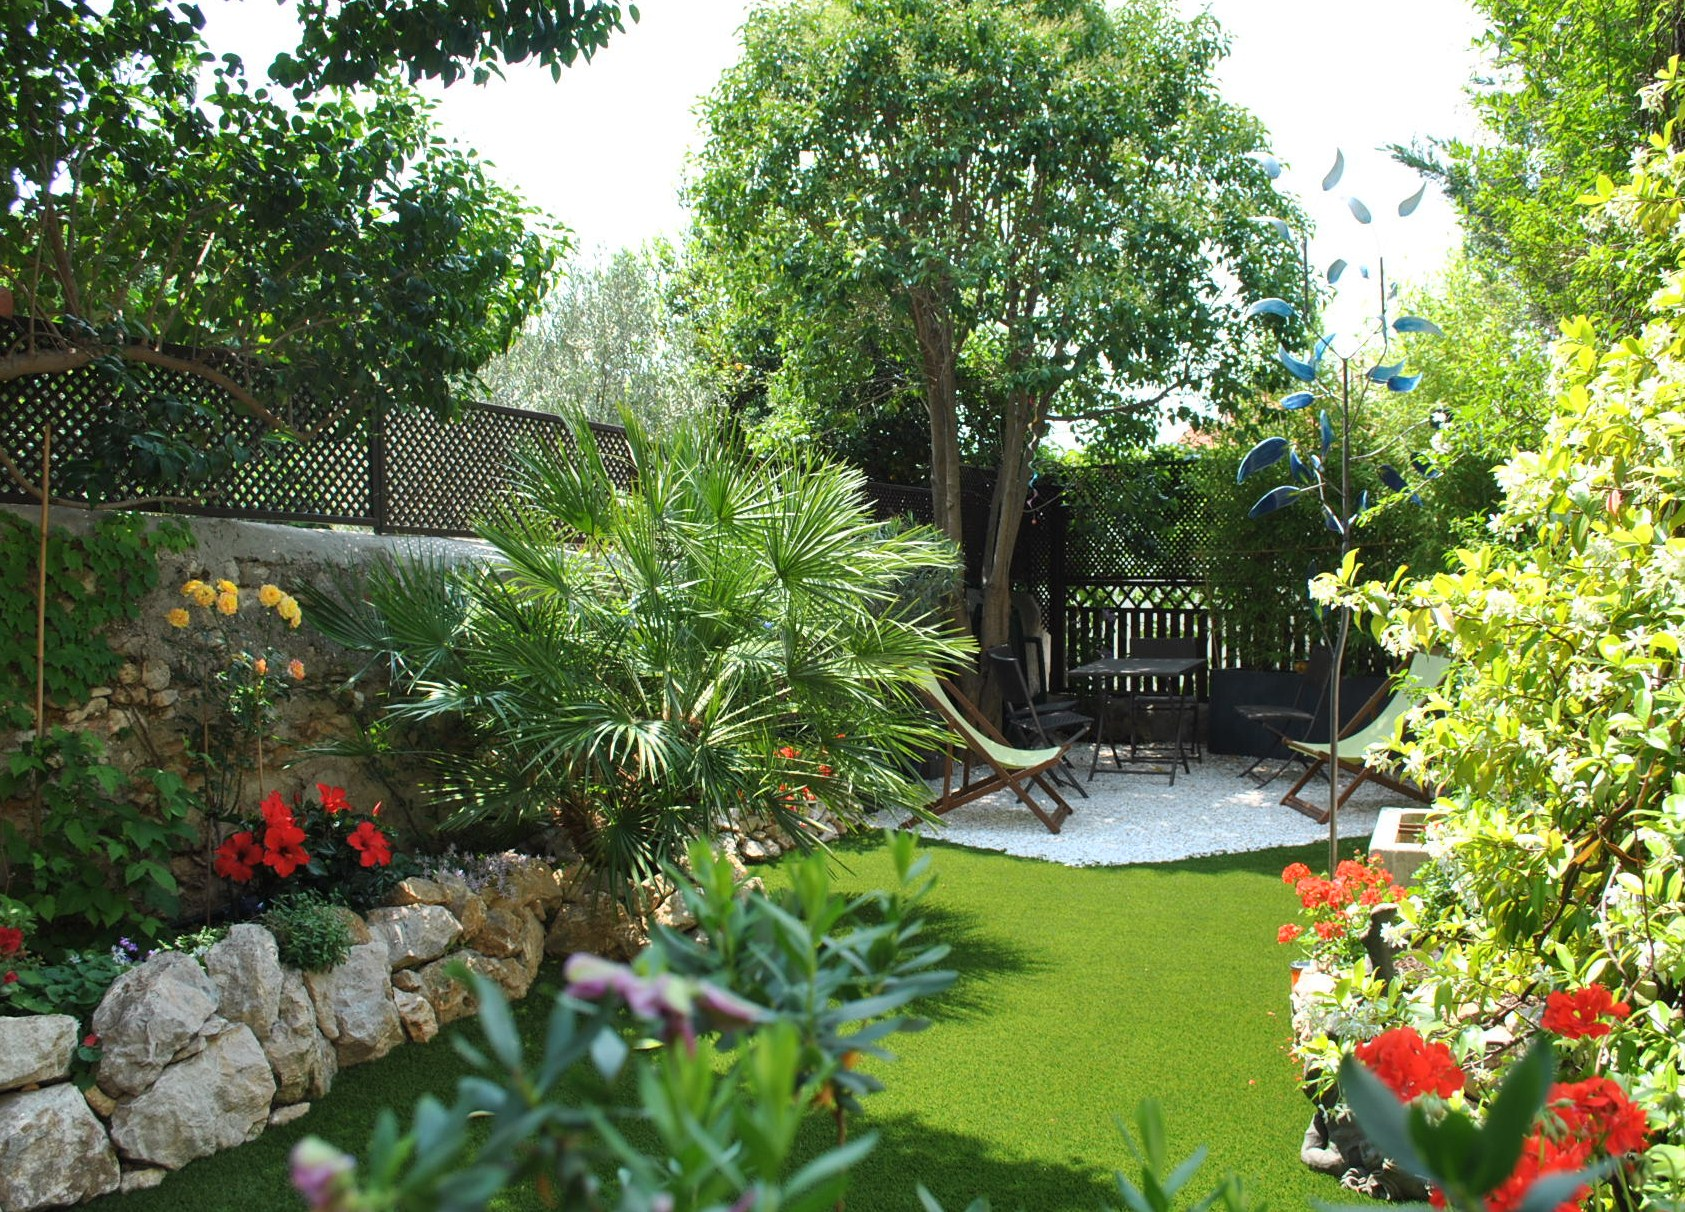 Le petit jardin marseille 7e arrondissement - Le petit jardin wittenberge colombes ...